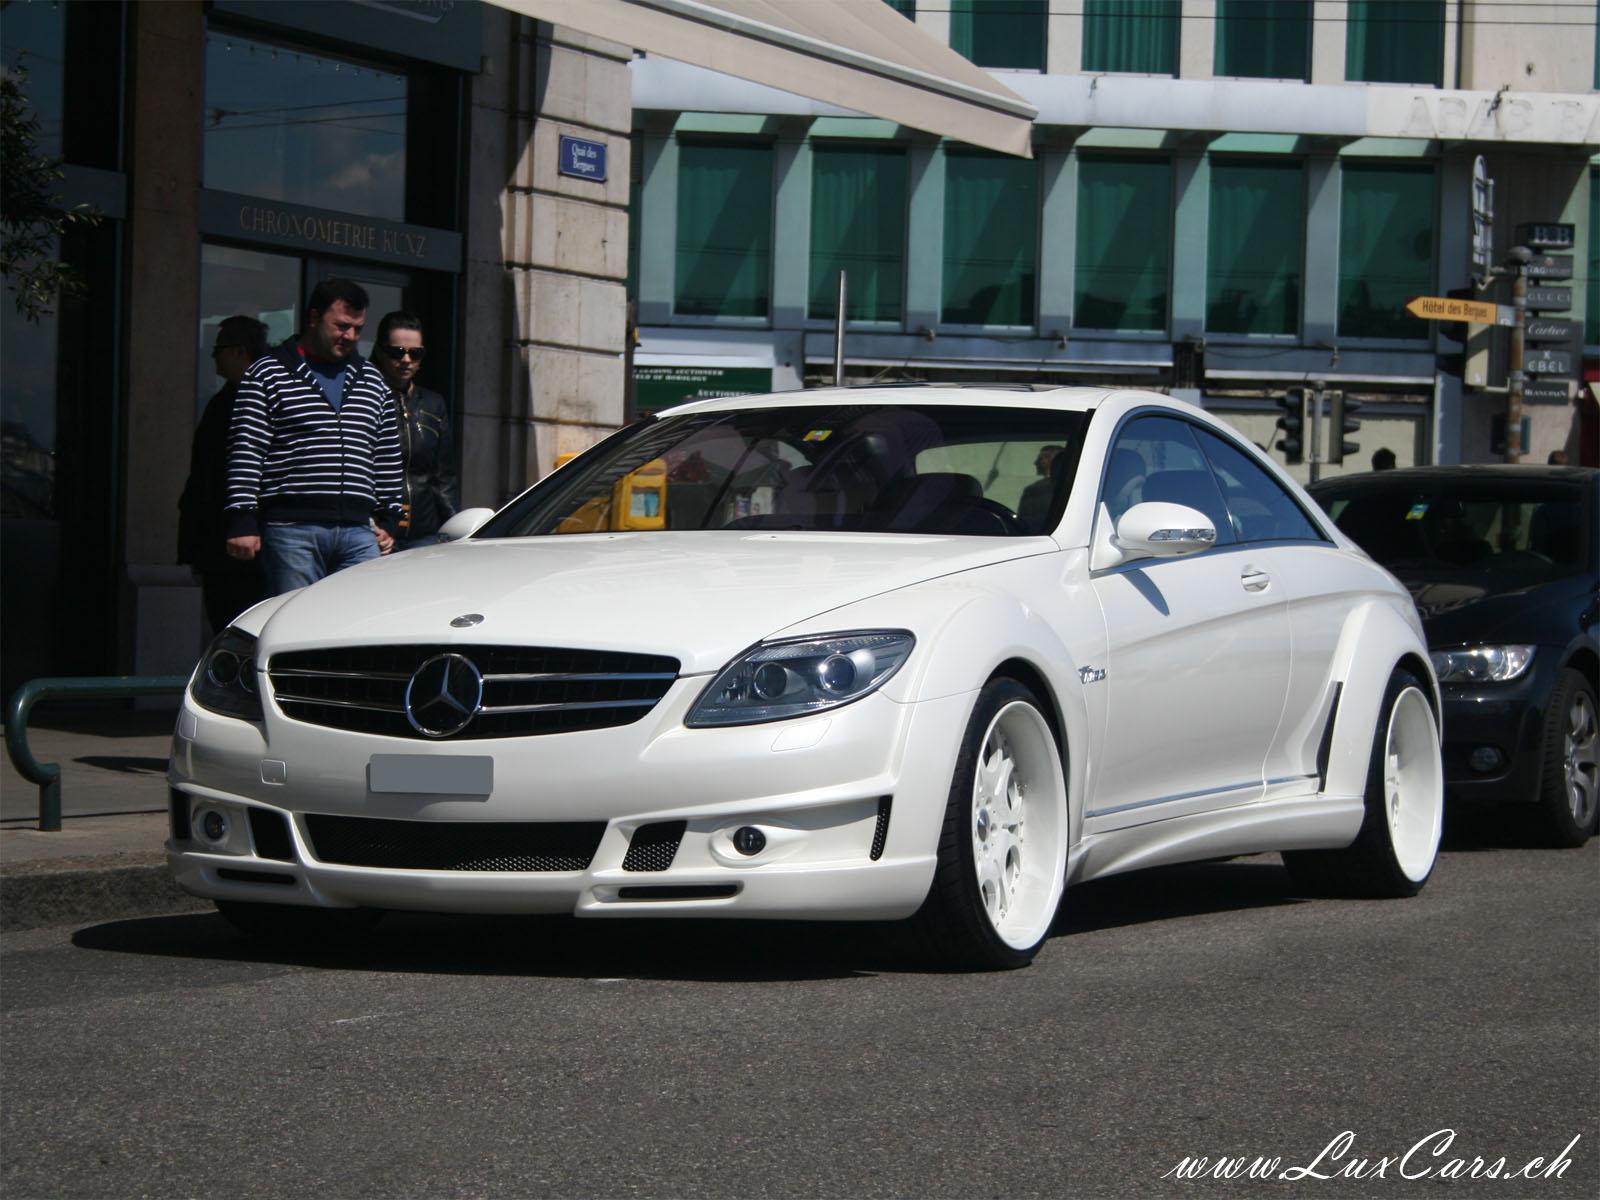 Mercedes benz cl65 amg fab design for Mercedes benz cl65